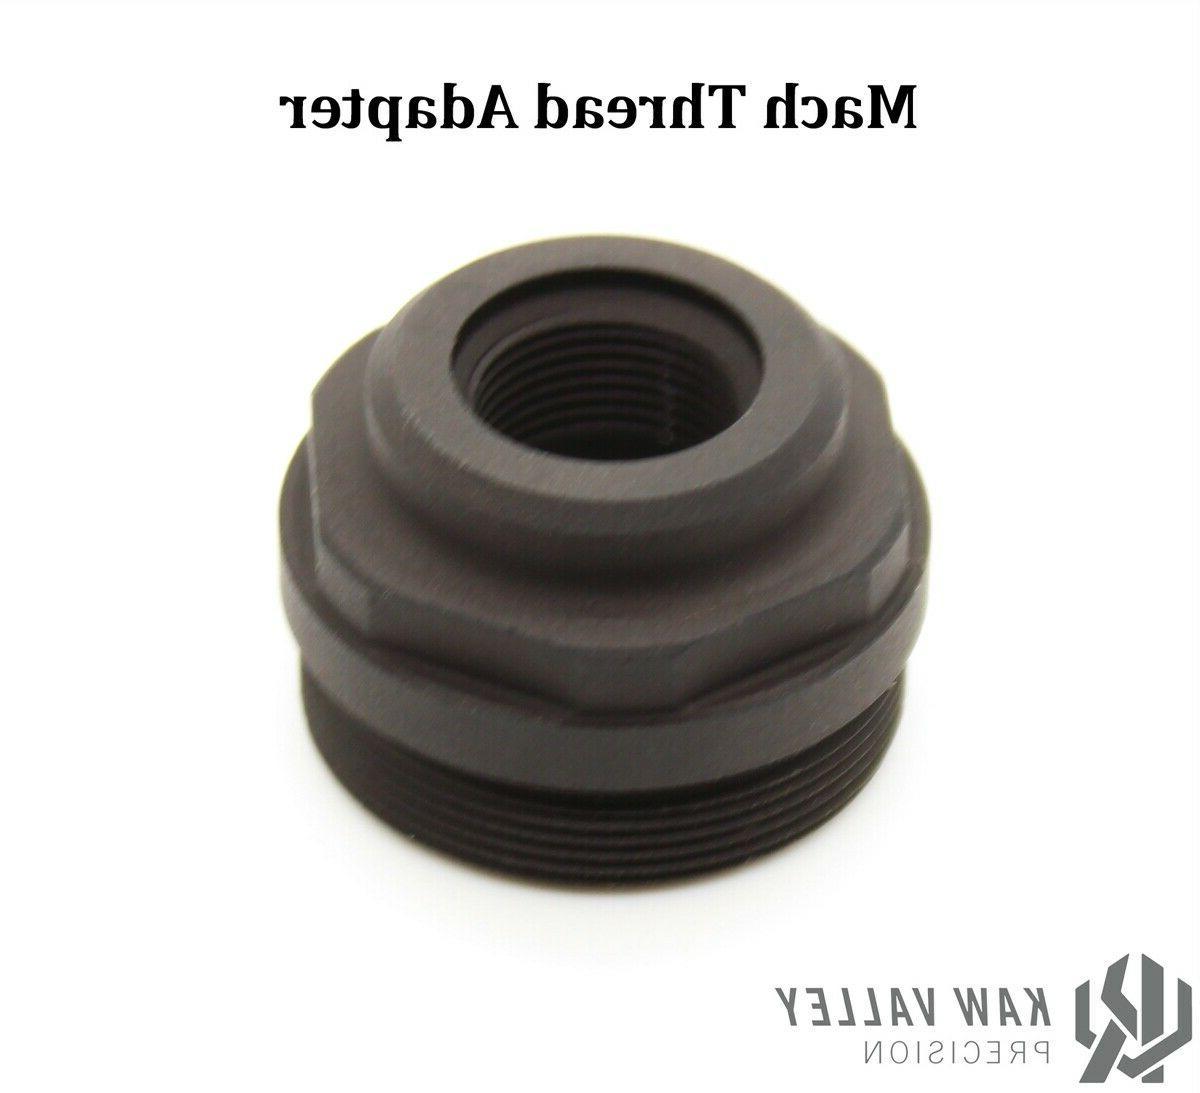 3 Modular Body Cap KVP